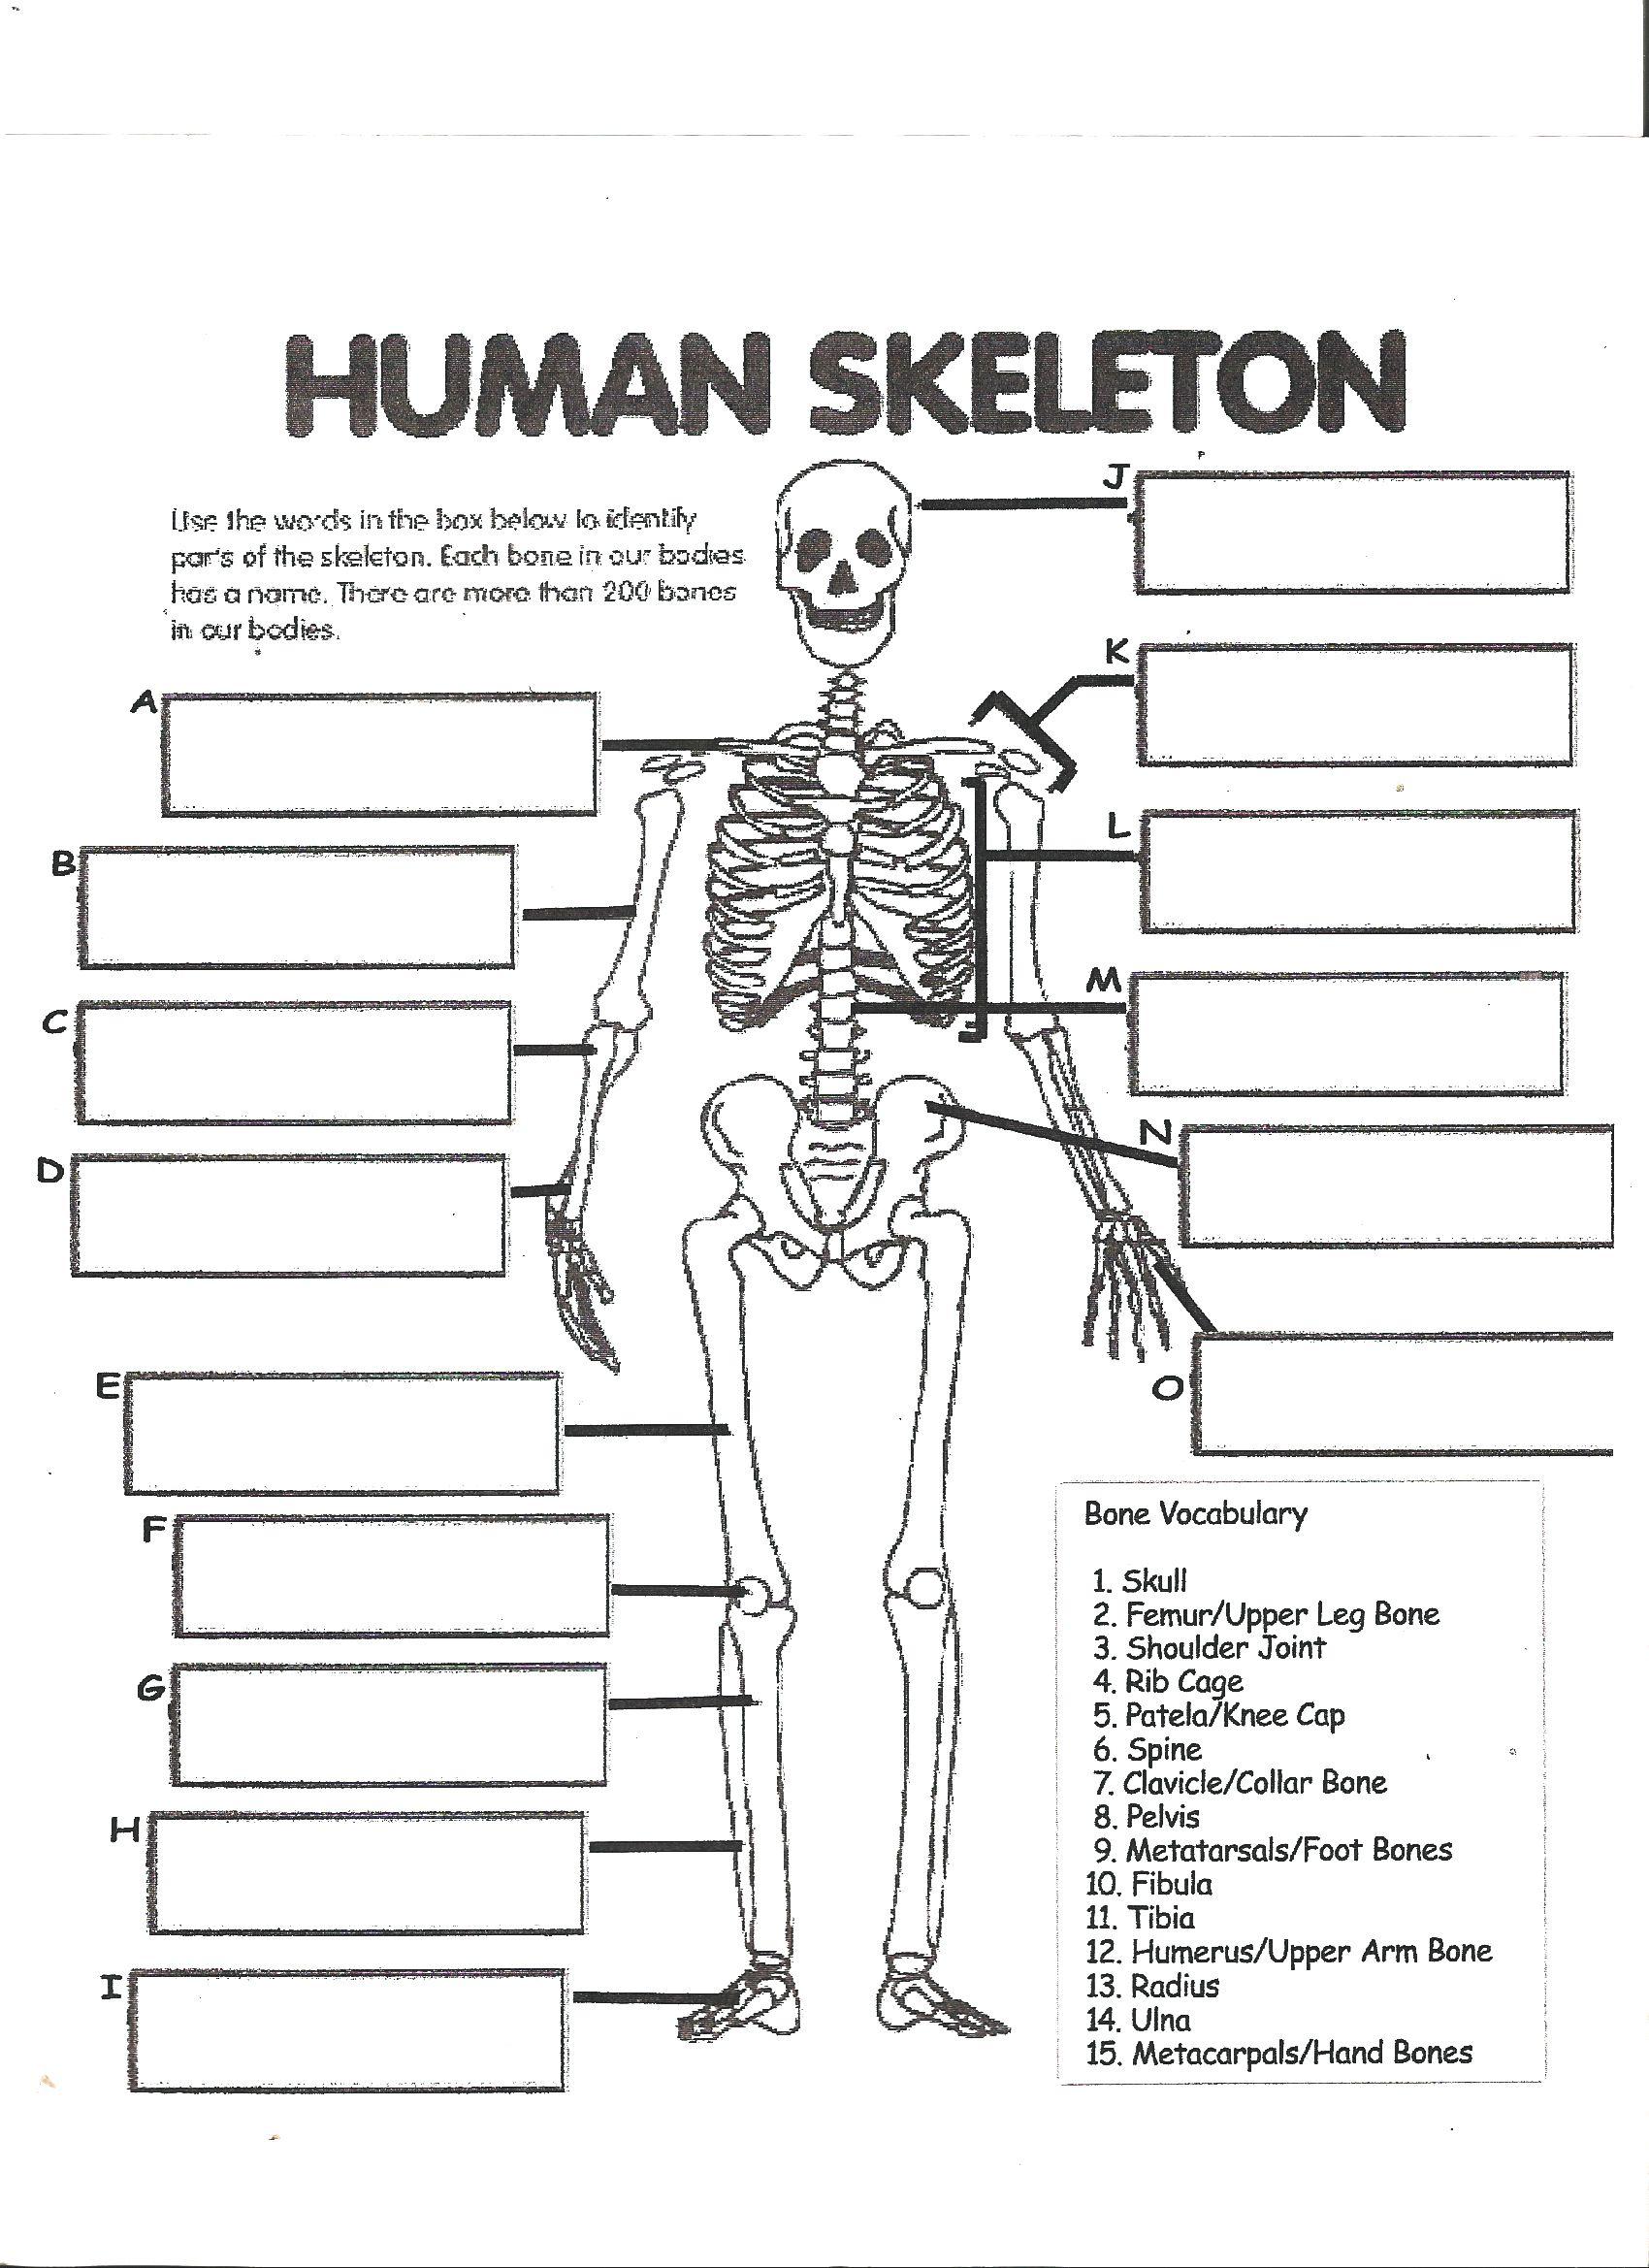 Digestive System Labeling Worksheet Answers Human skeleton ...